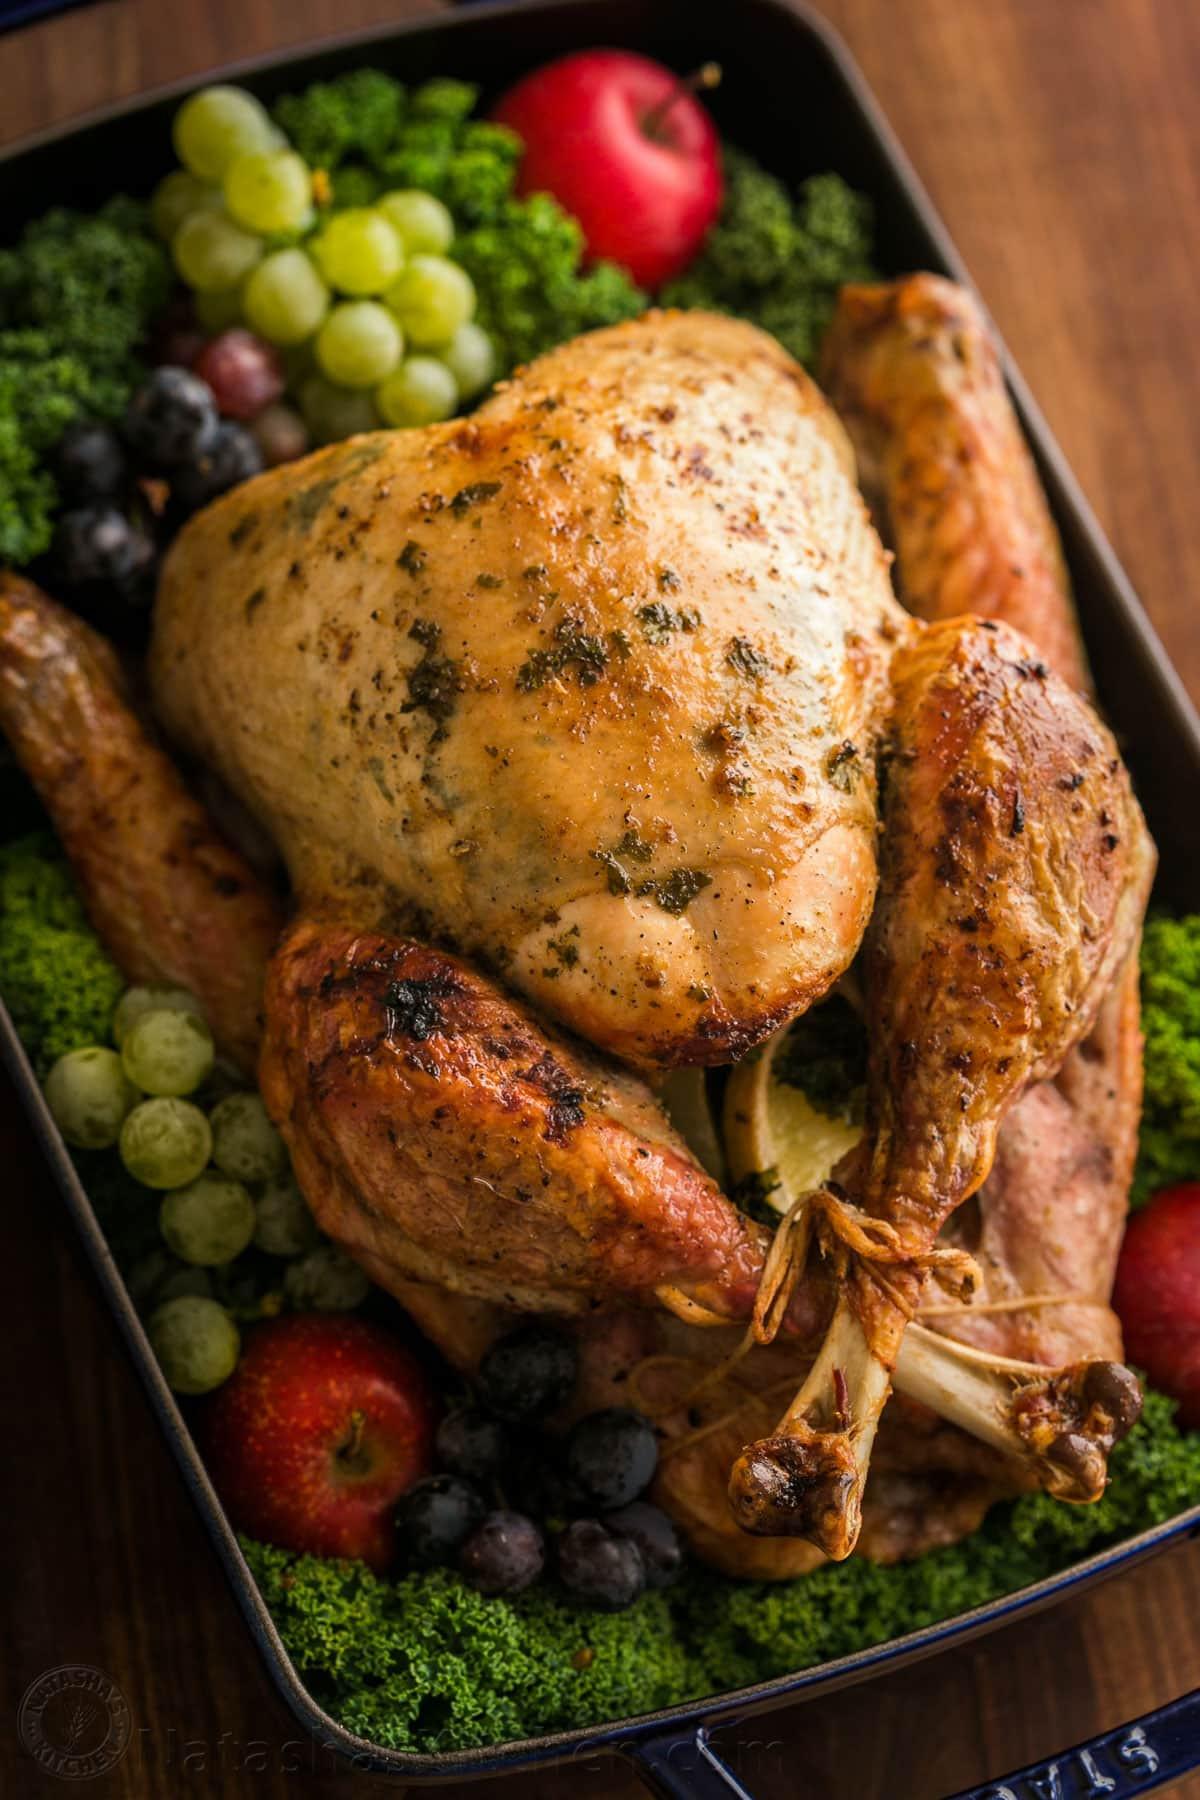 Recipes For Thanksgiving Turkey  Thanksgiving Turkey Recipe VIDEO NatashasKitchen